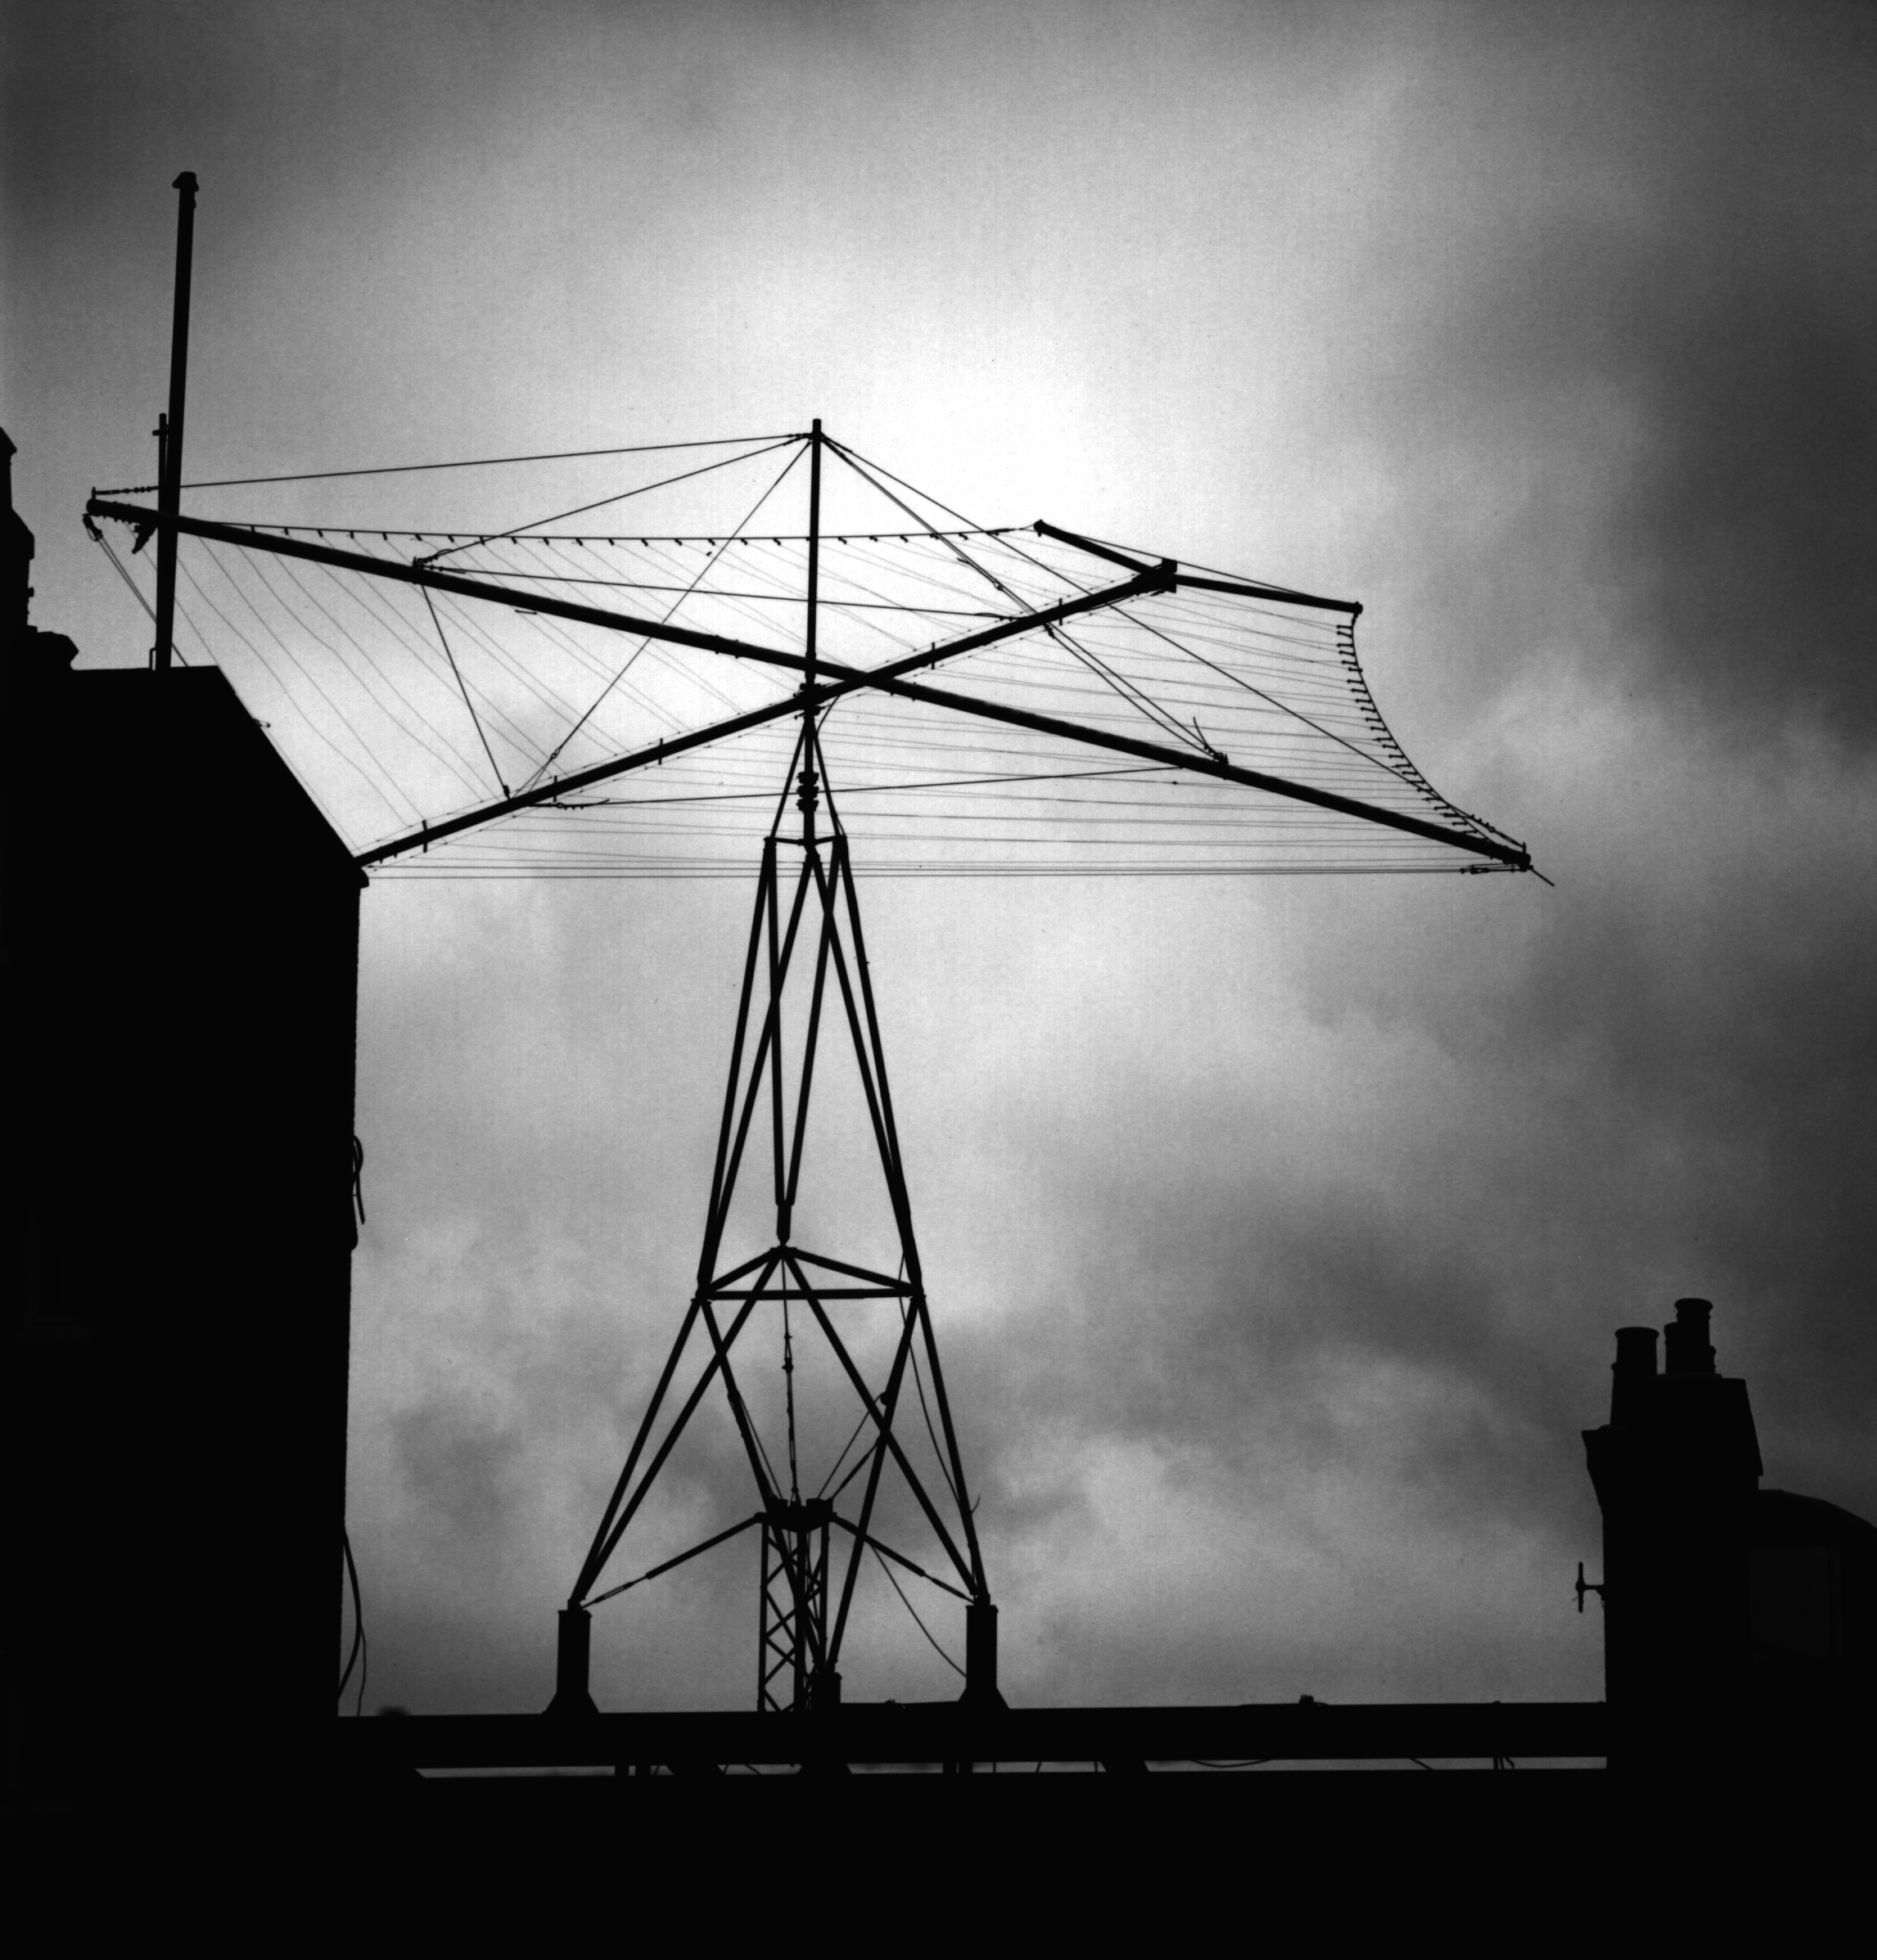 http://www.irdial.com/dorchester_antenna_closeup.jpg